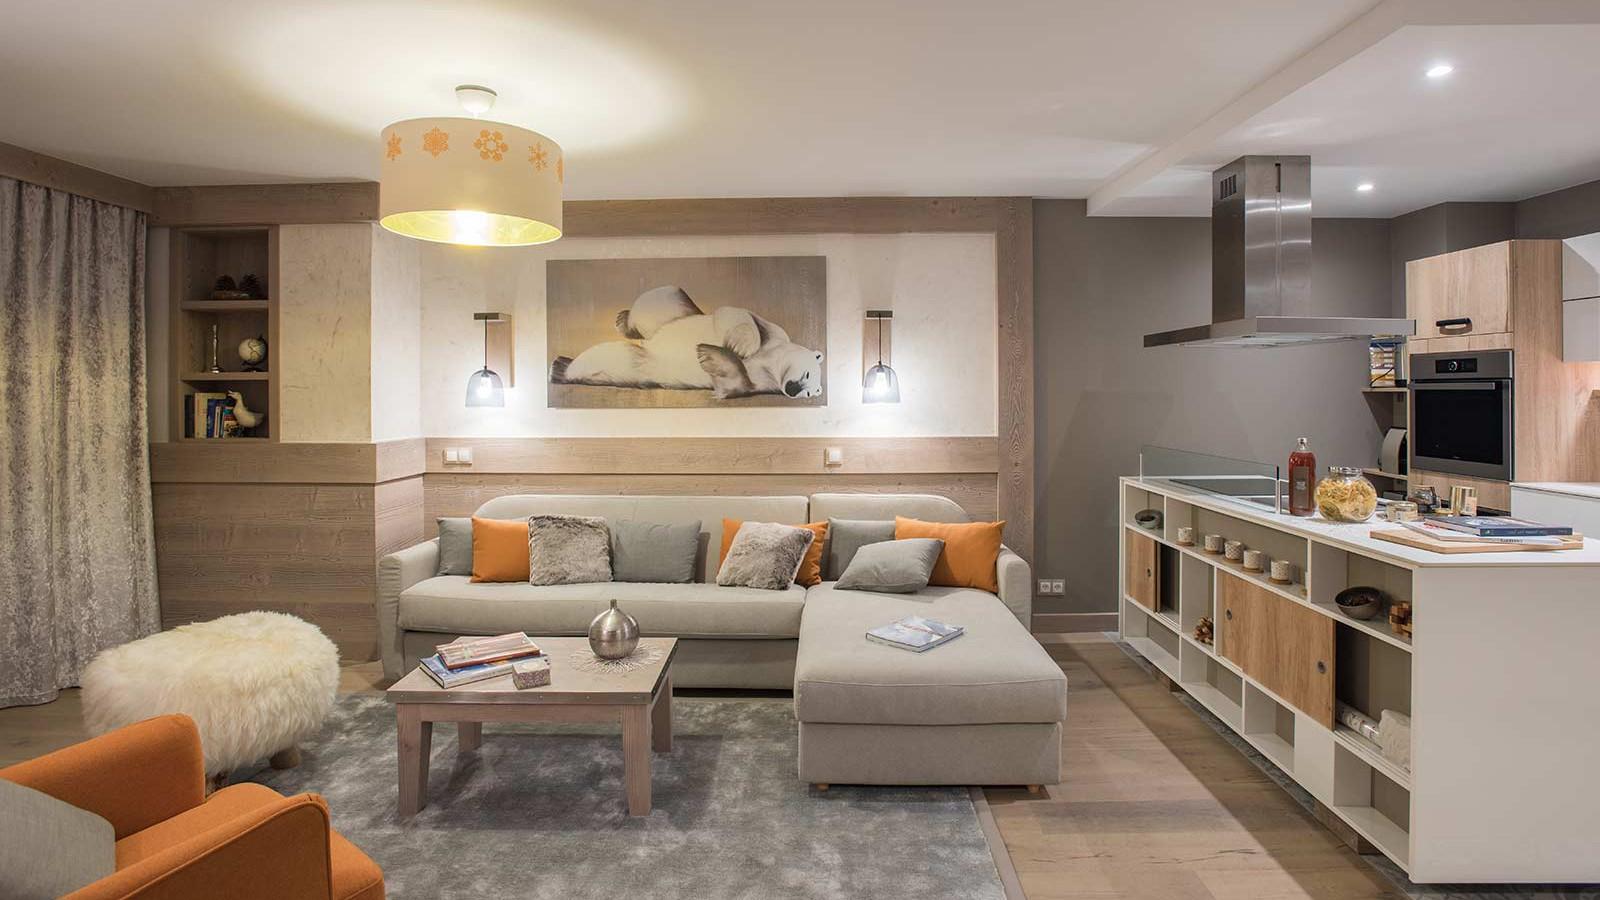 l'Hevana luxury ski apartments, Meribel, France